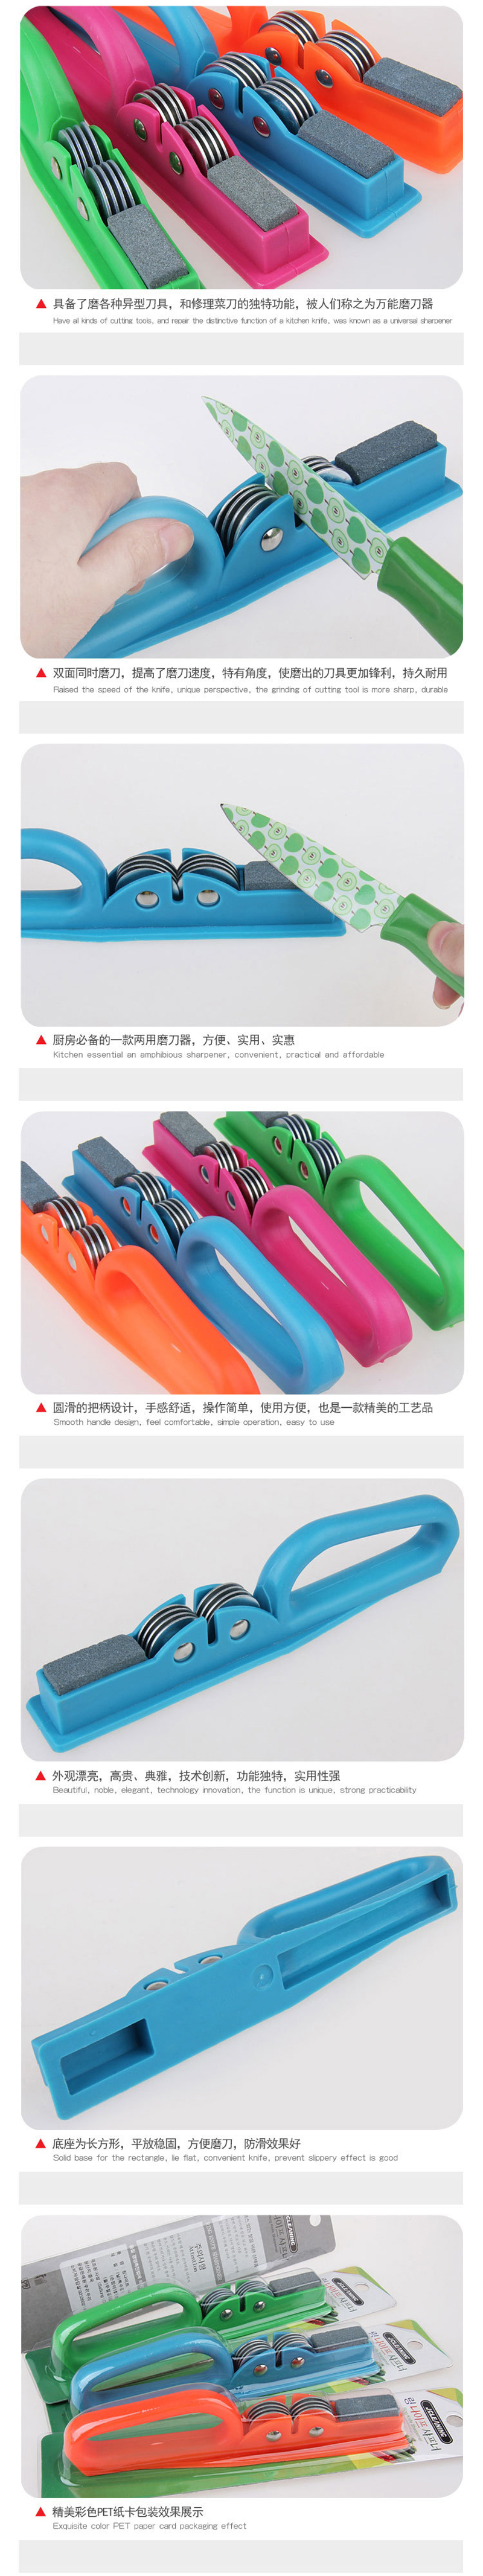 GOUGU Brand Multi fuction Knife Sharpener Double Side Tungsten Steel ...